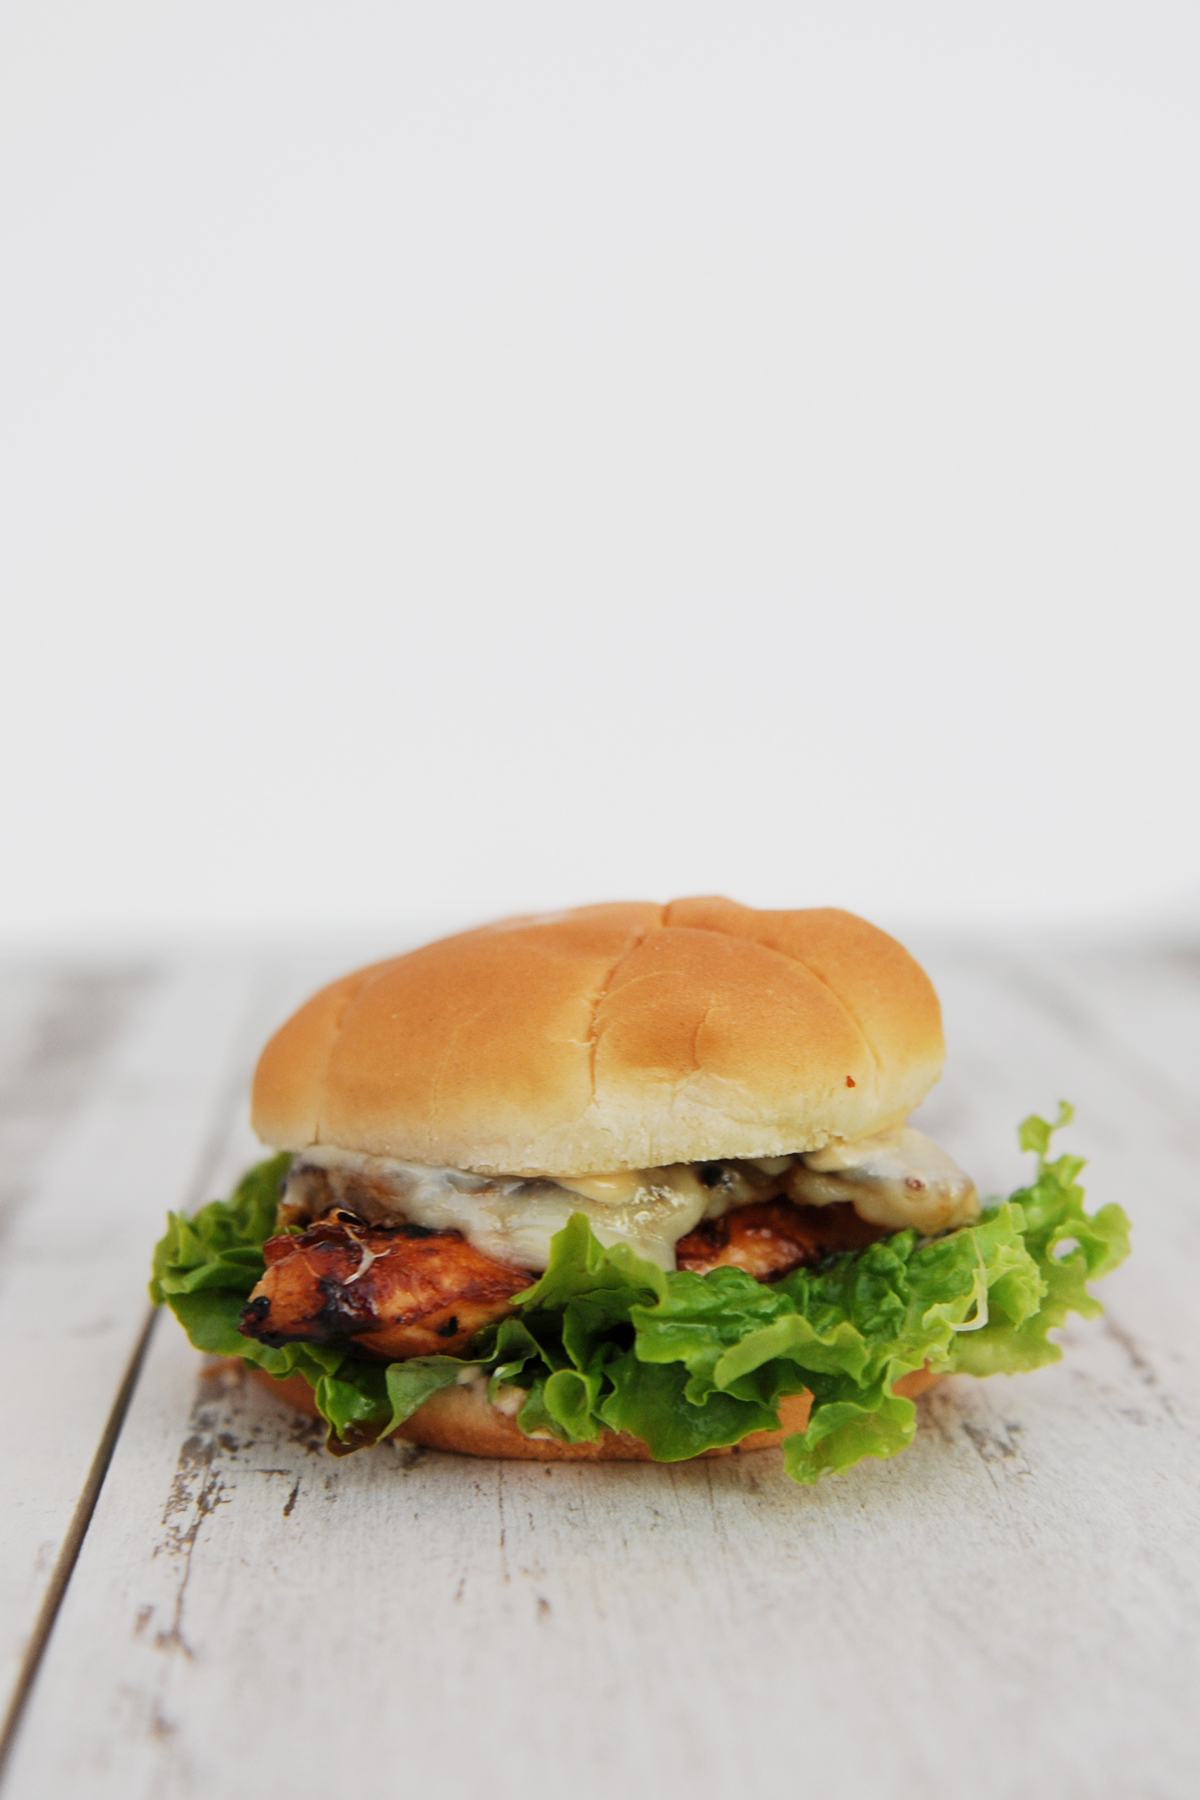 Chicken Teriyaki and Grilled Pineapple Sandwich Recipe